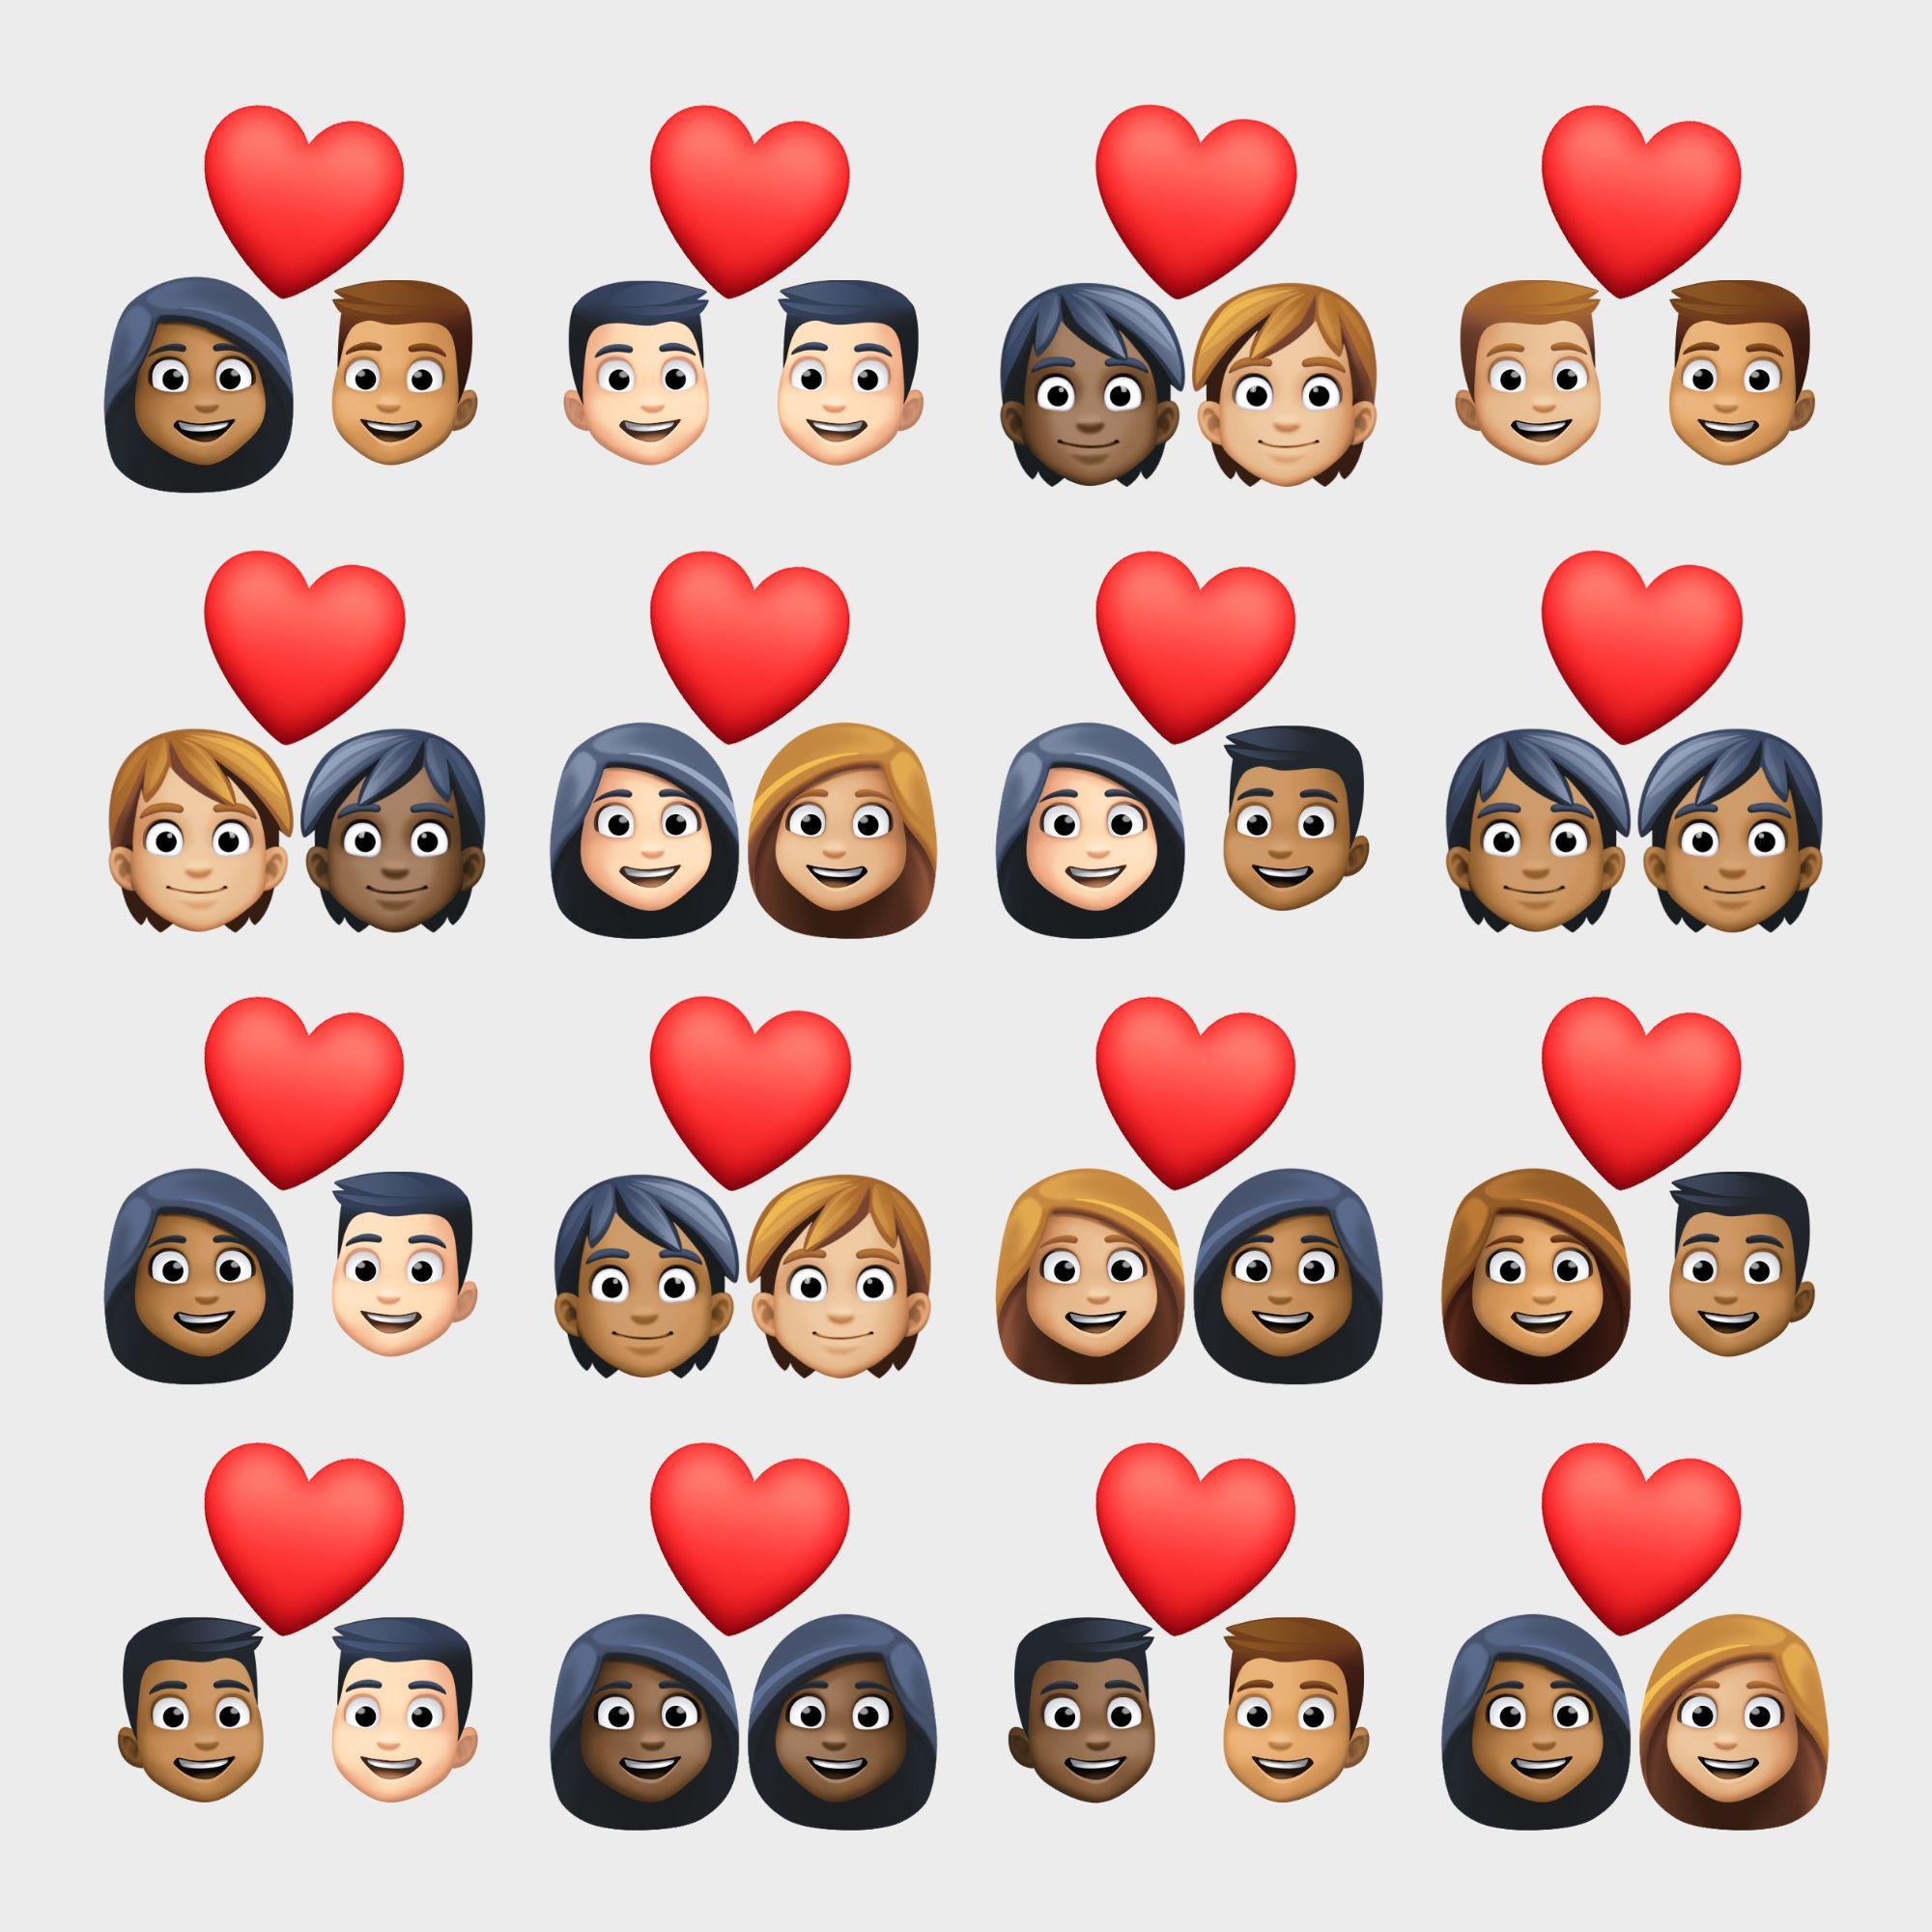 Emojipedia-Facebook-13_1-Emoji-Changelog-New-Couple-With-Heart-Selection